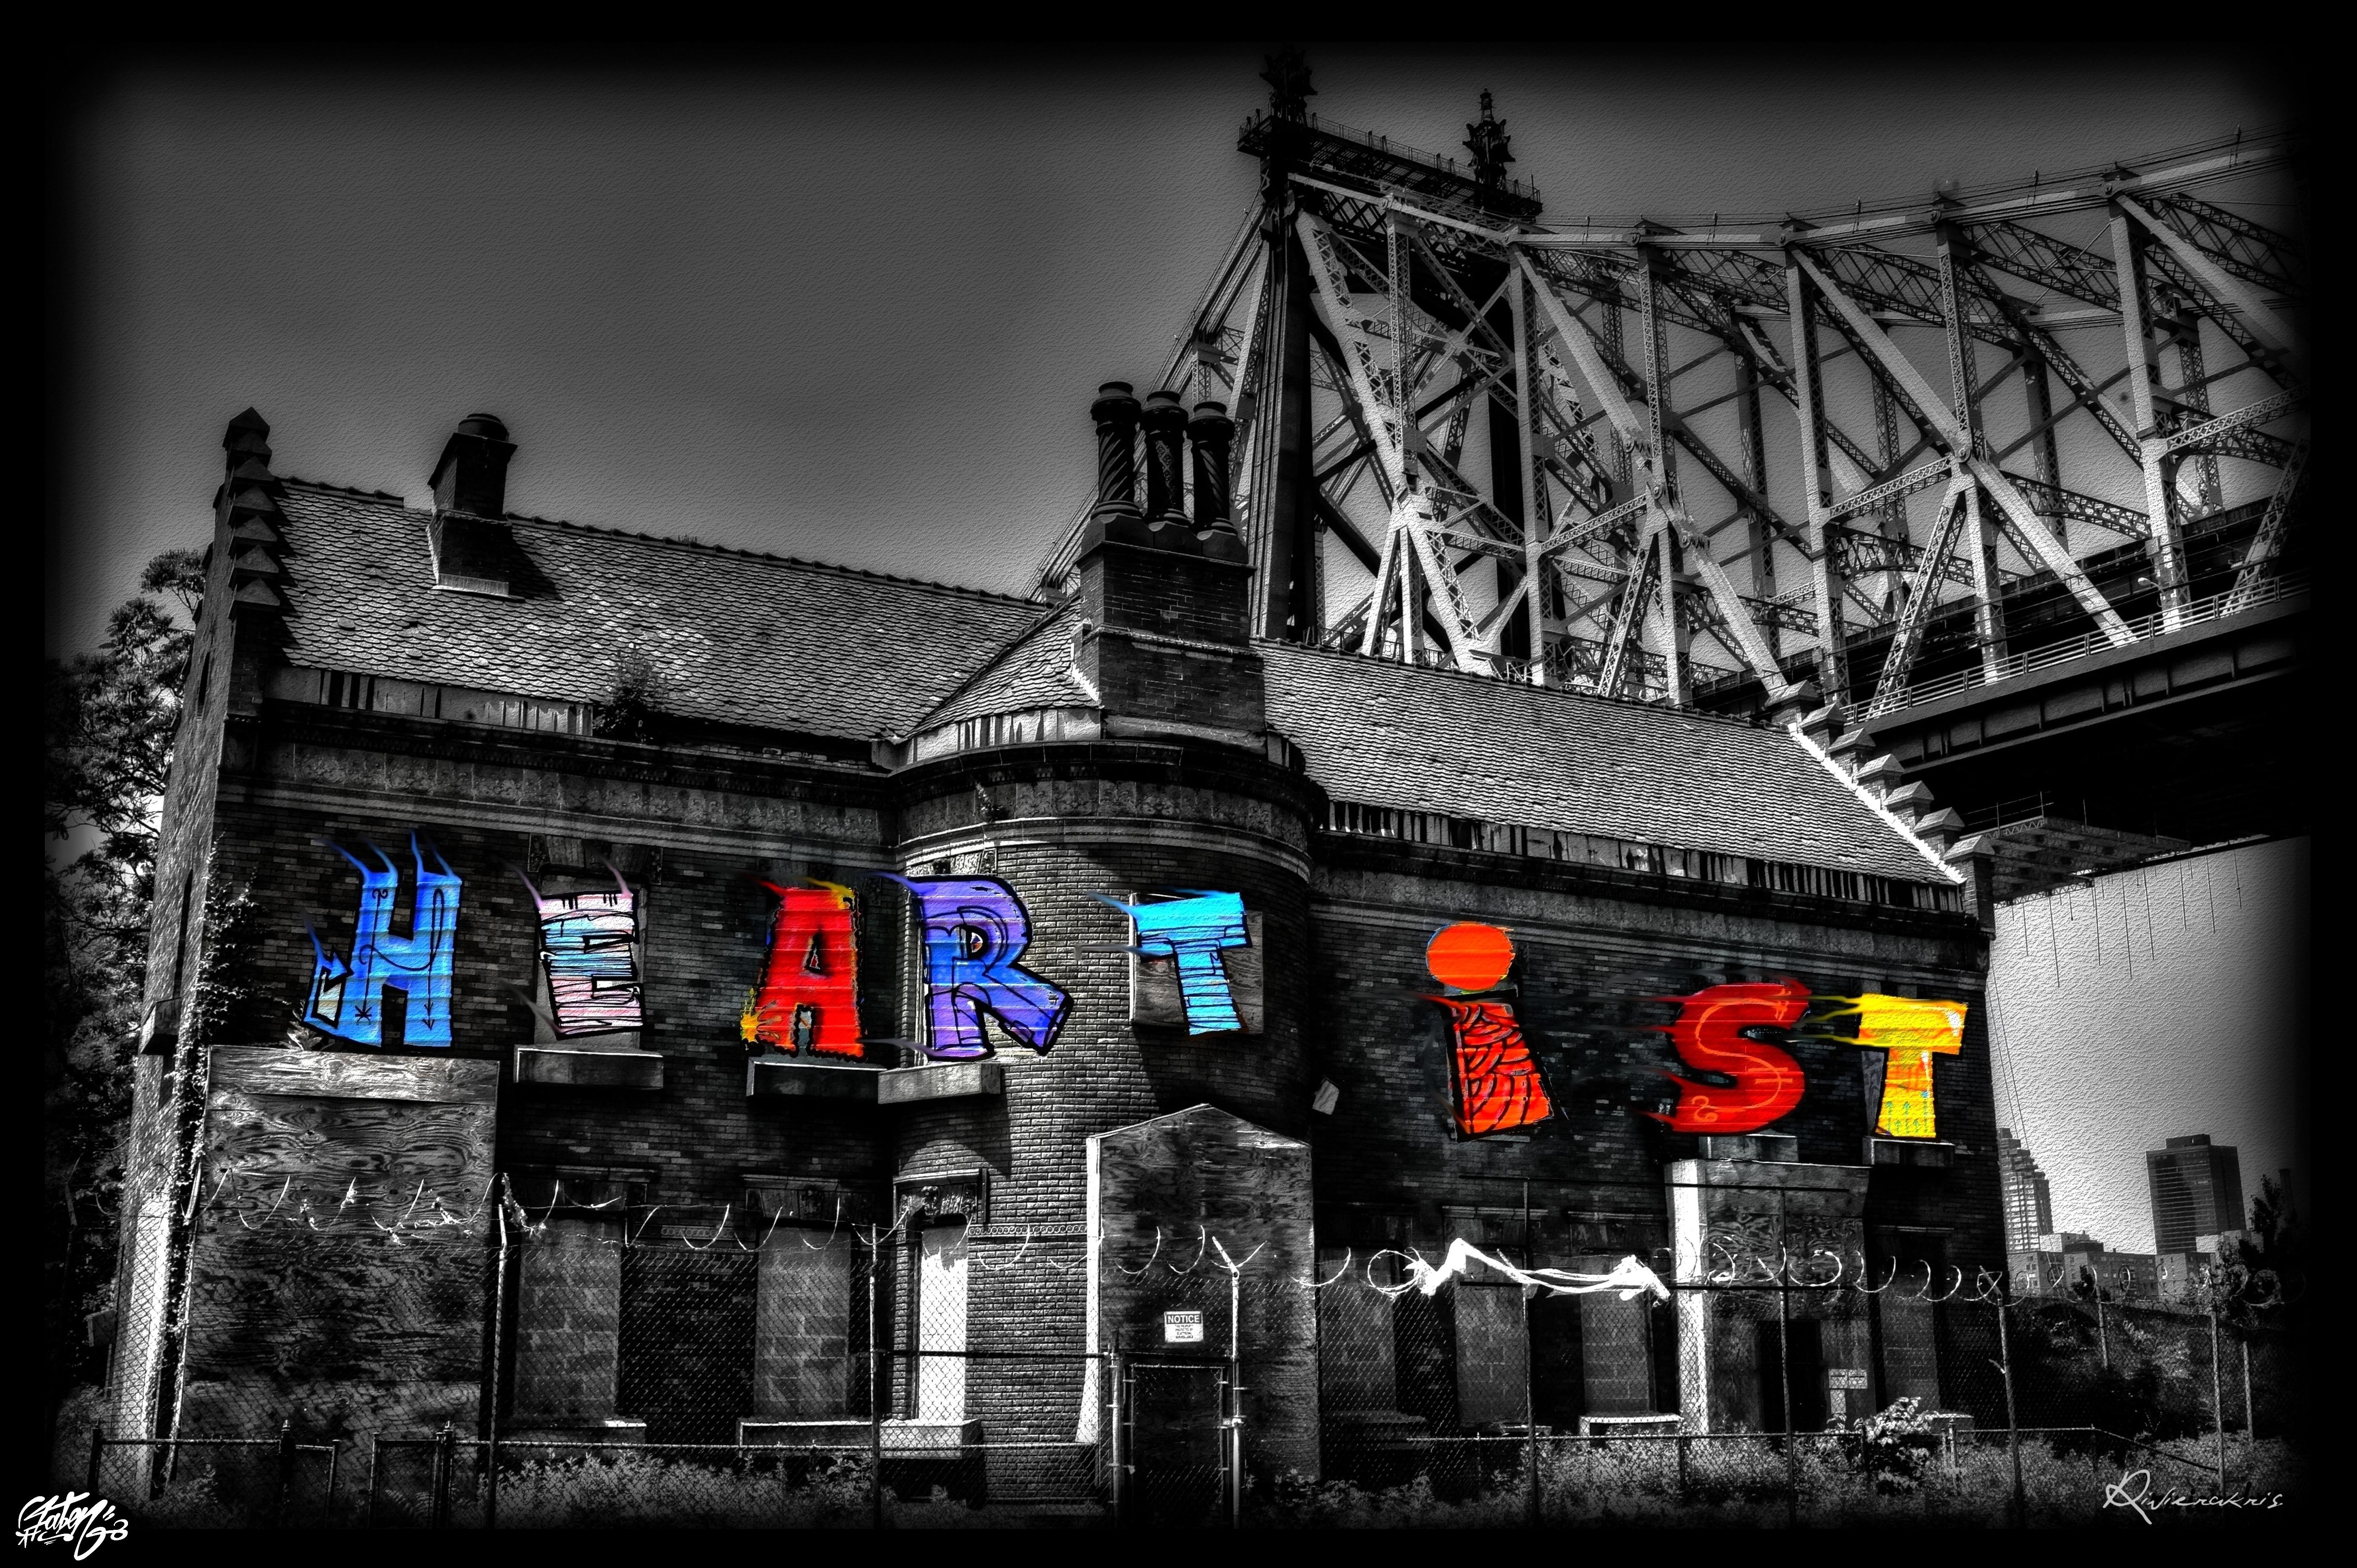 Heartist House